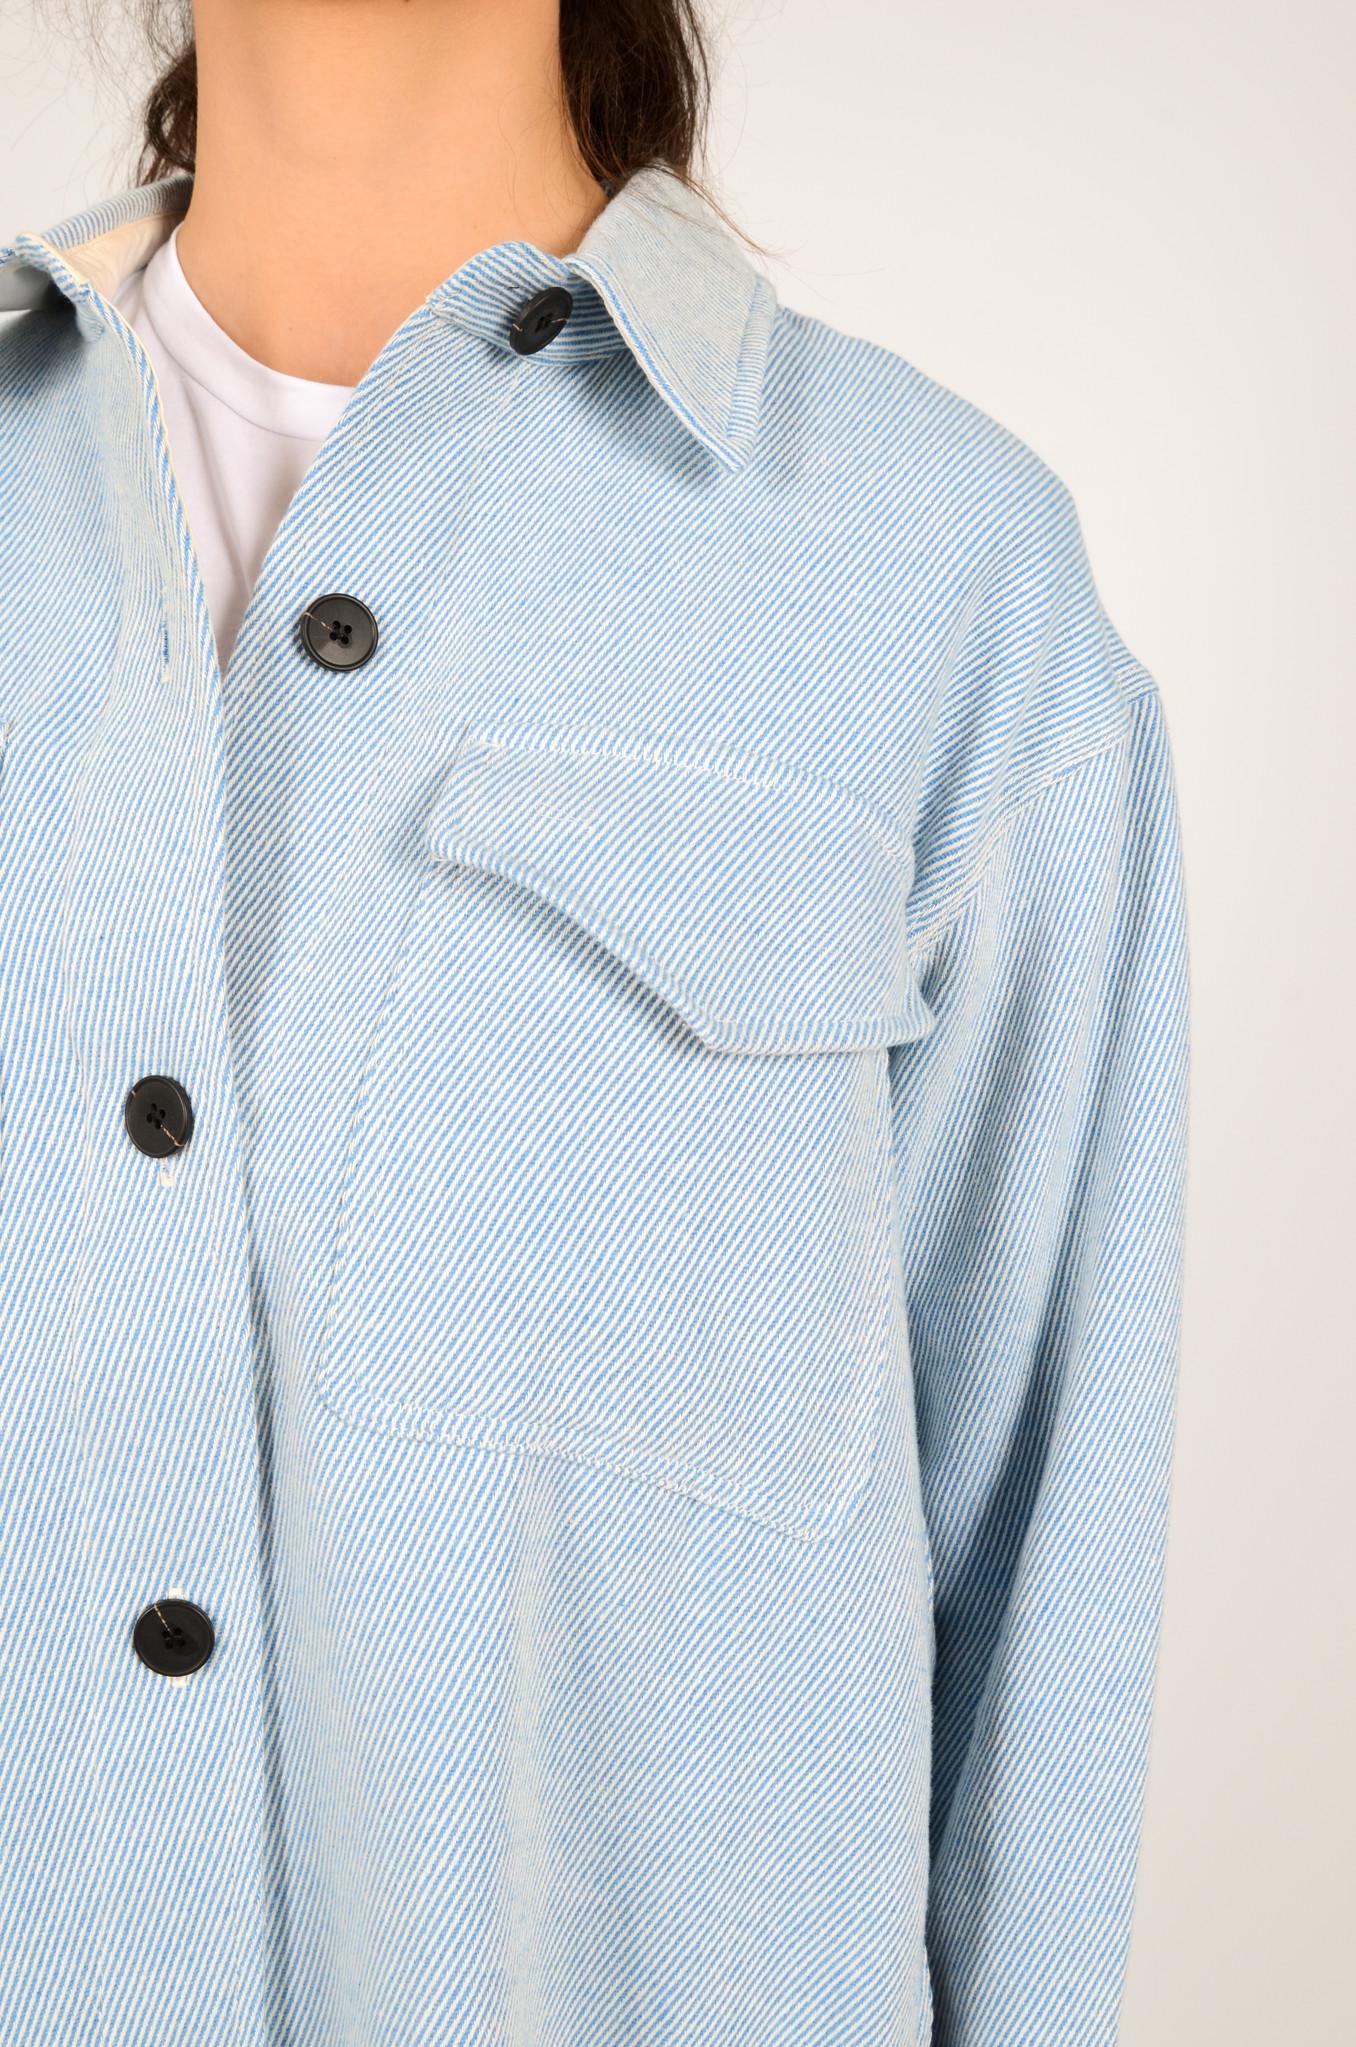 PALERMO SHIRT COAT IN DUSTY BLUE-5